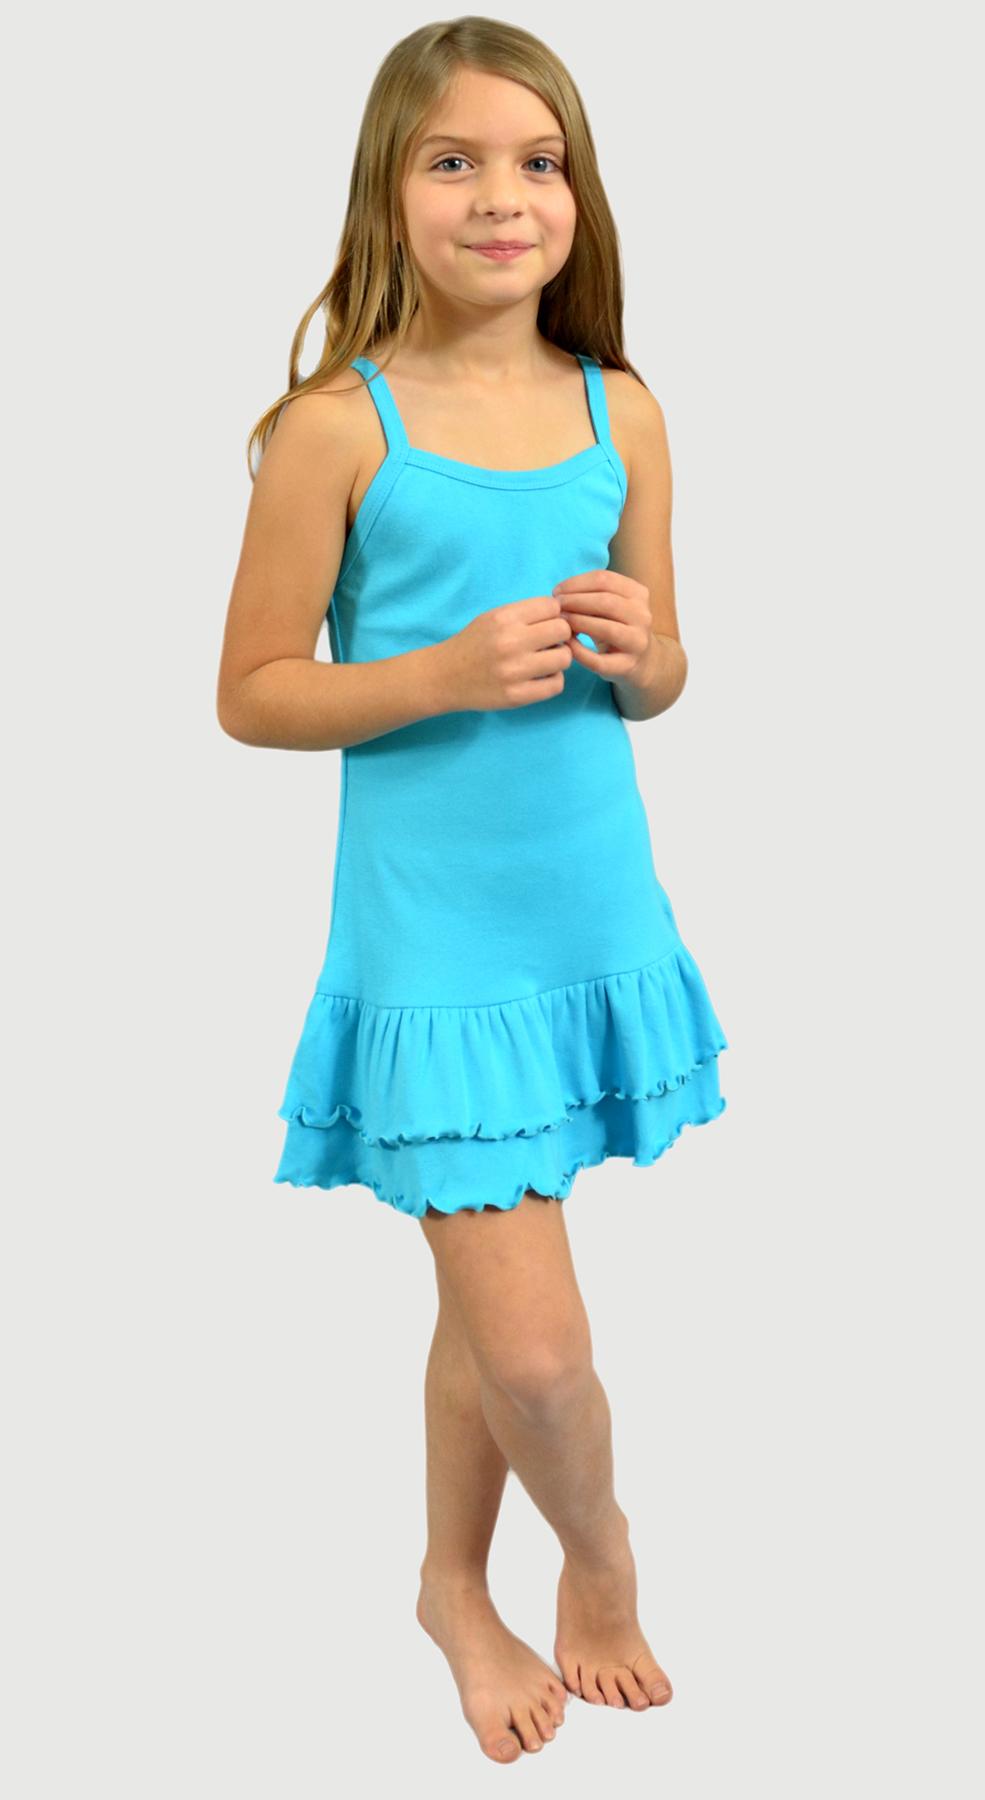 Monag 402150 - Baby Rib Spaghetti Strap Layered Dress